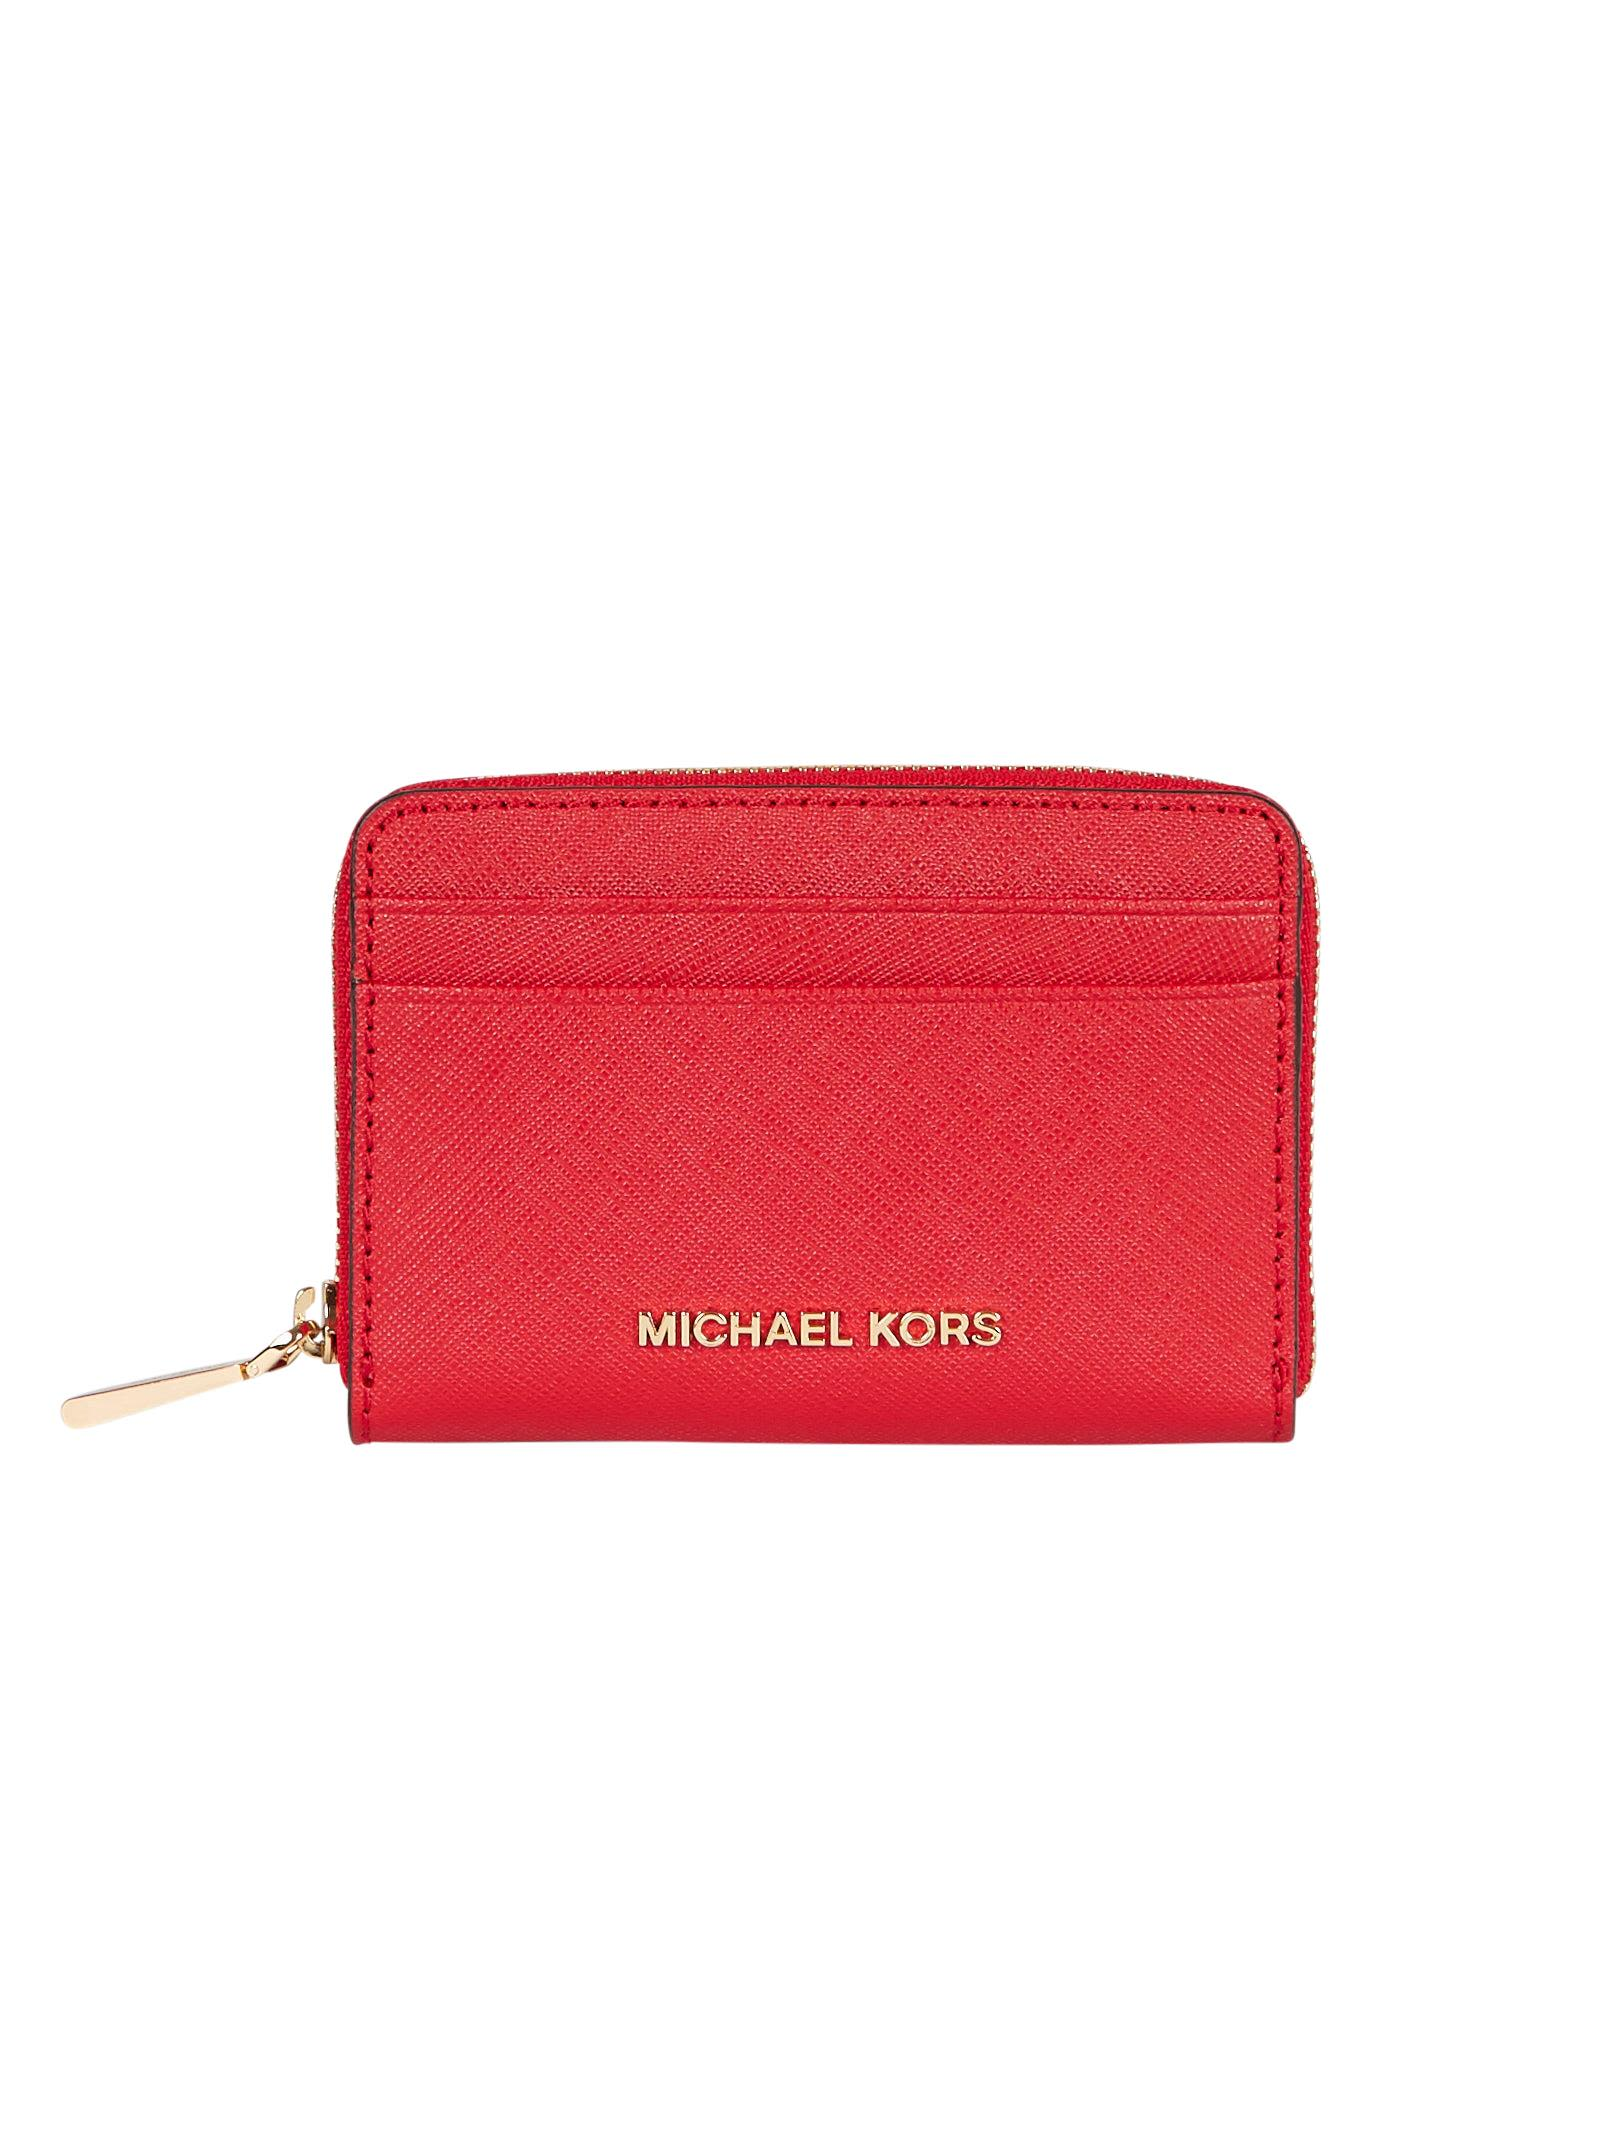 Michael Michael Kors Money Pieces Card Holder Wallet